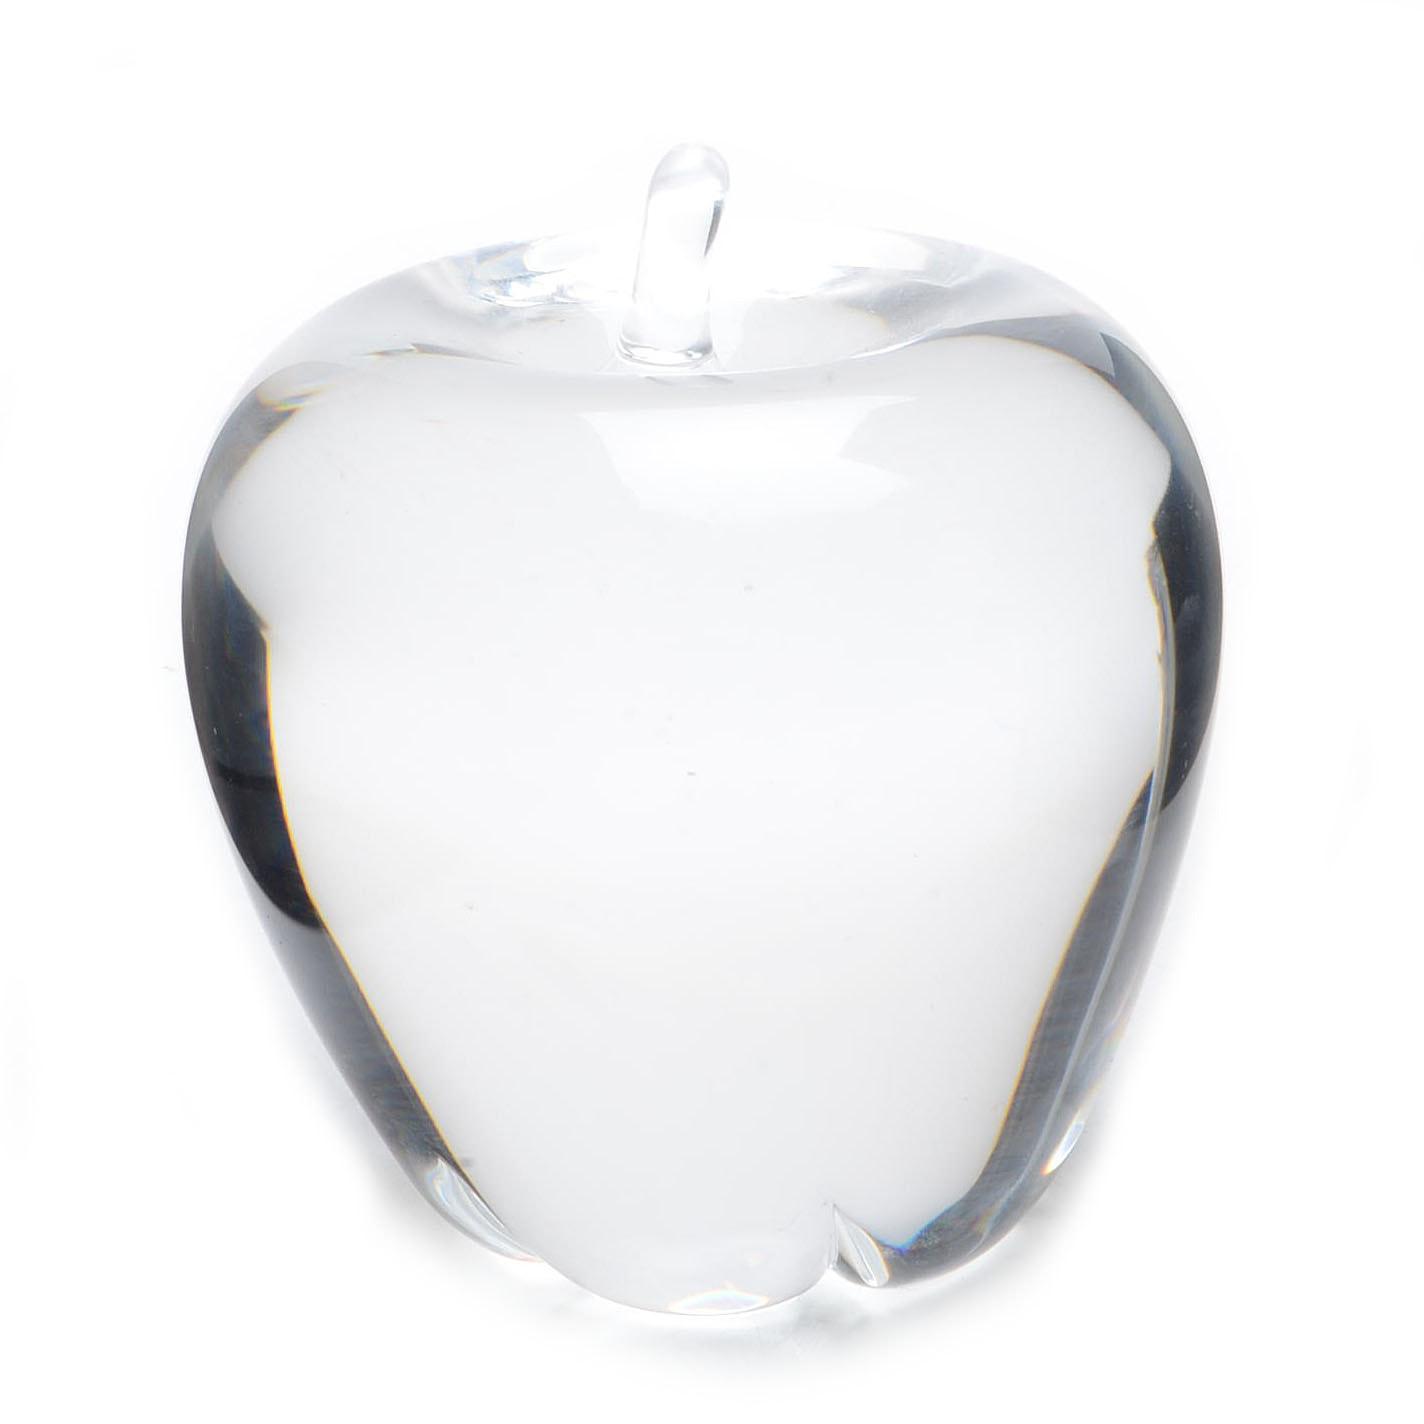 Angus McDougall's Steuben Crystal Apple